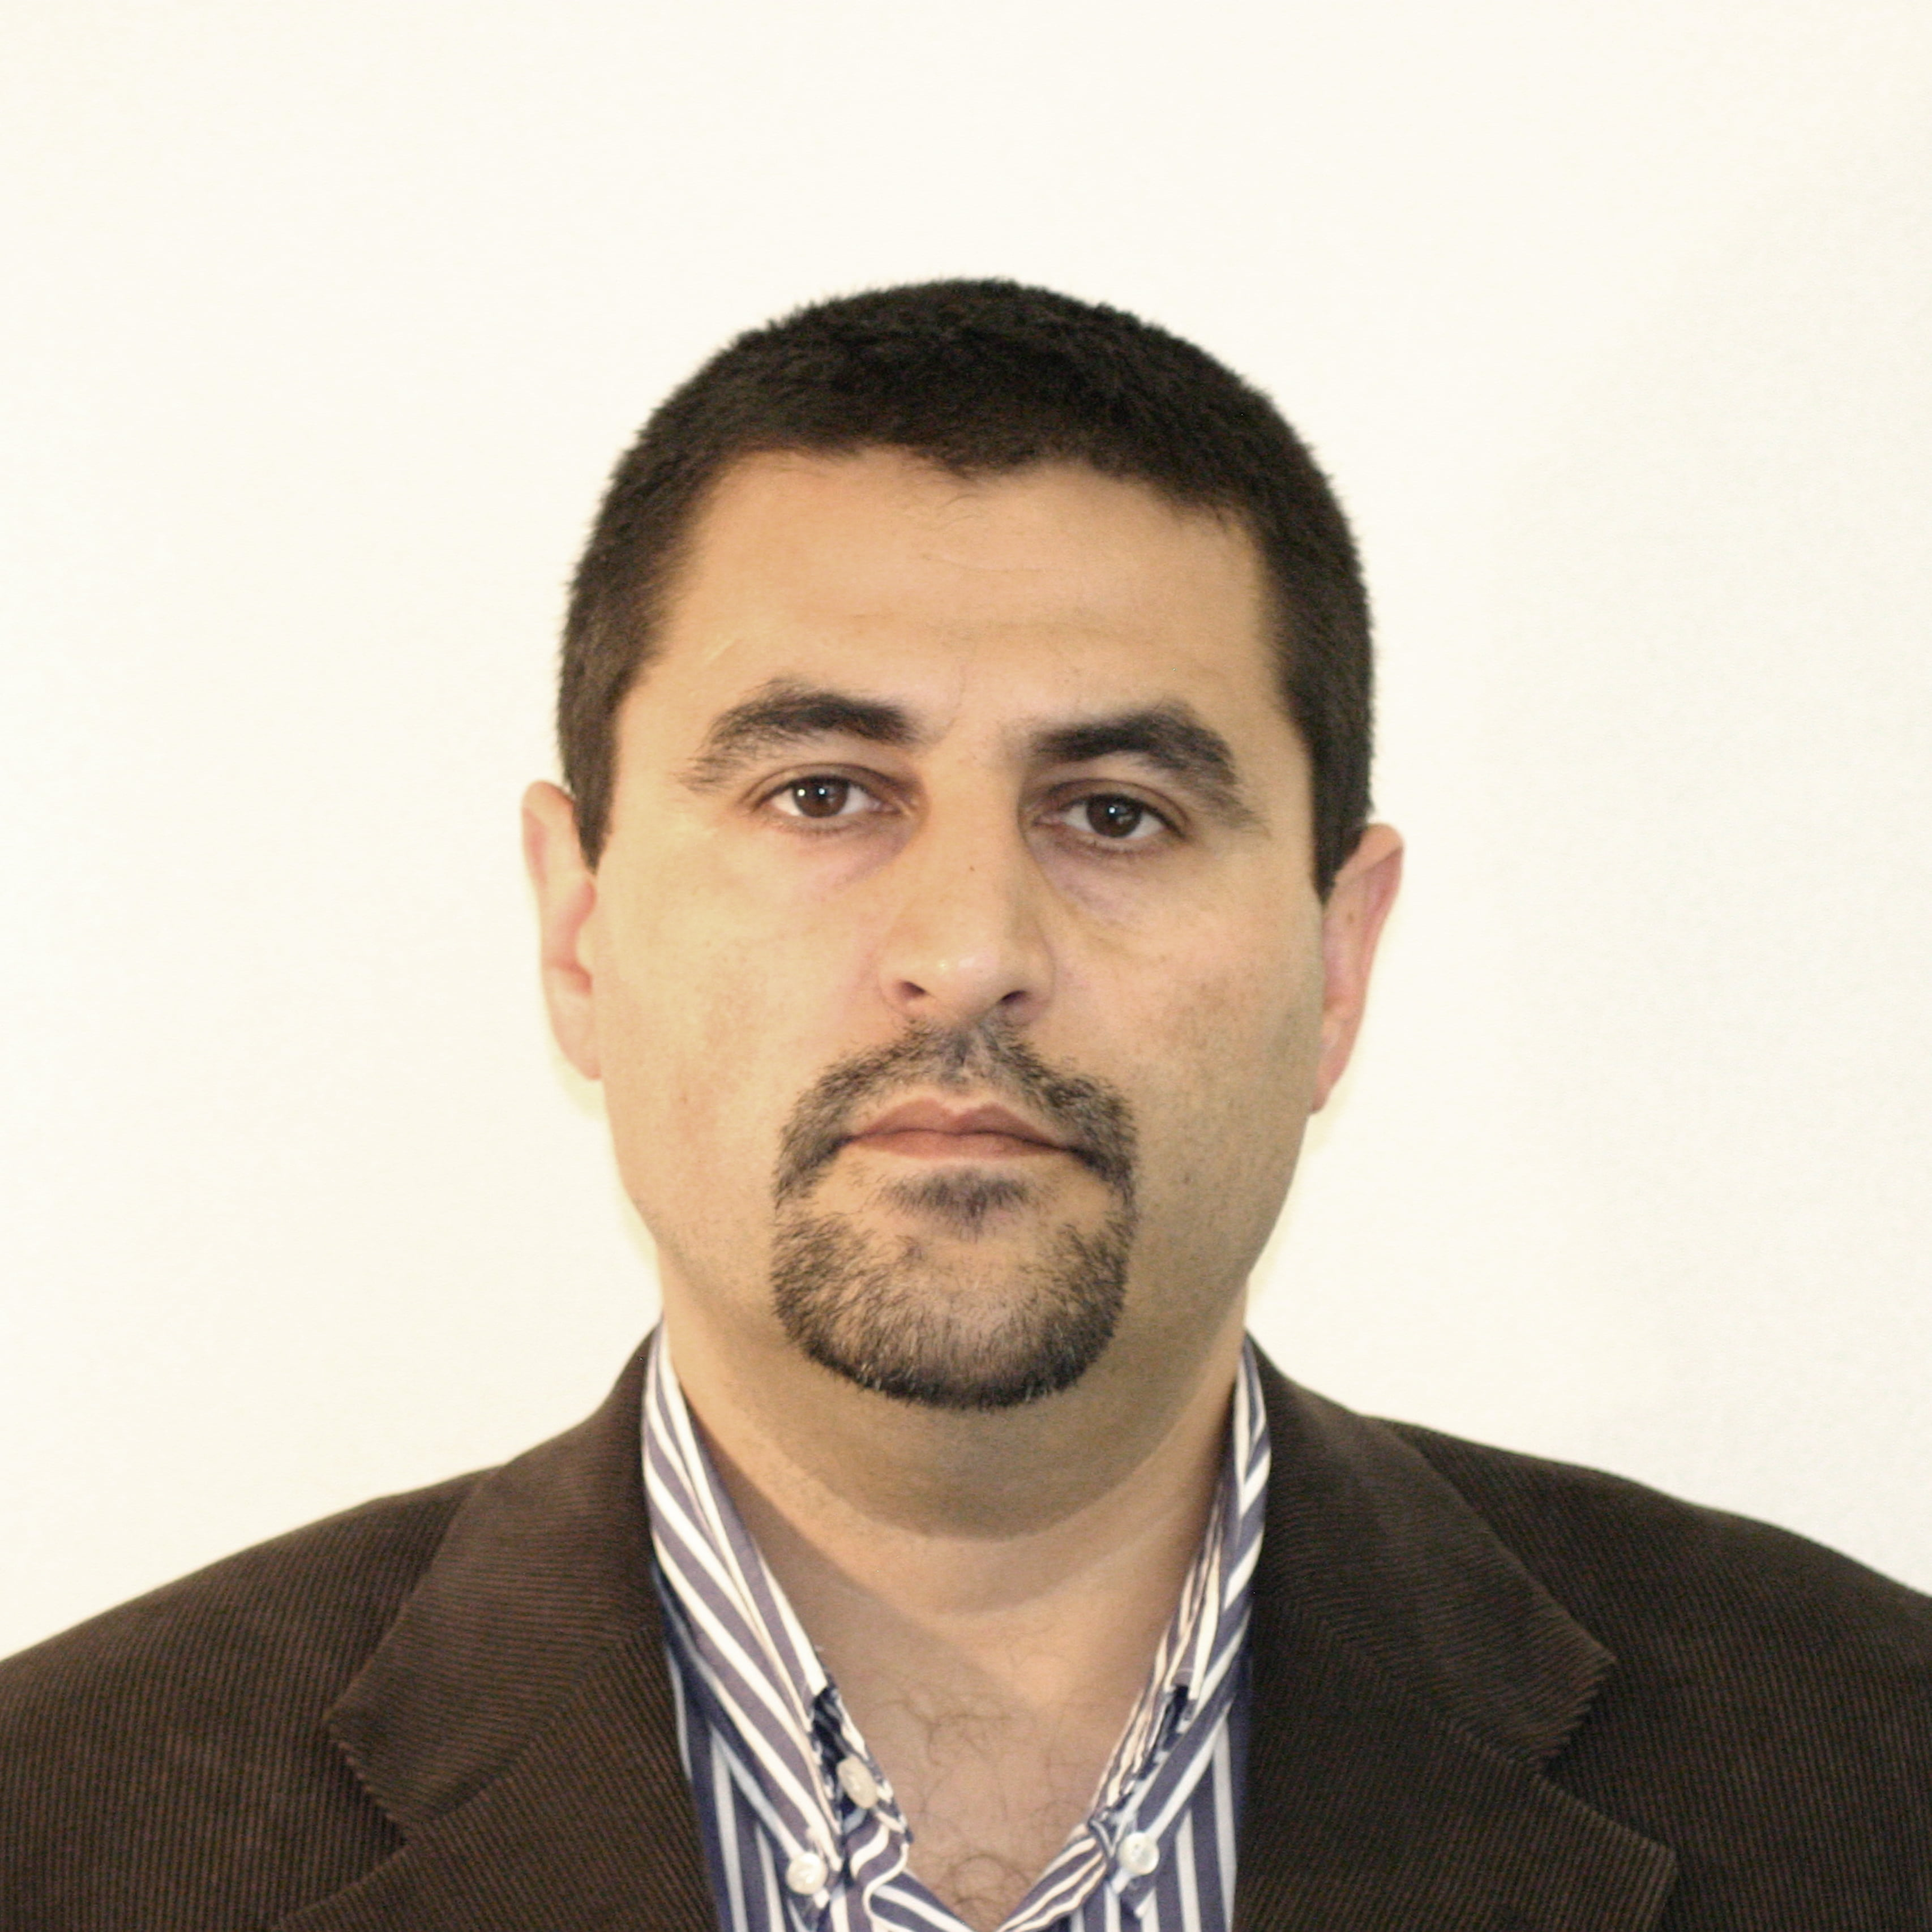 Diego Miñarro Quiñonero